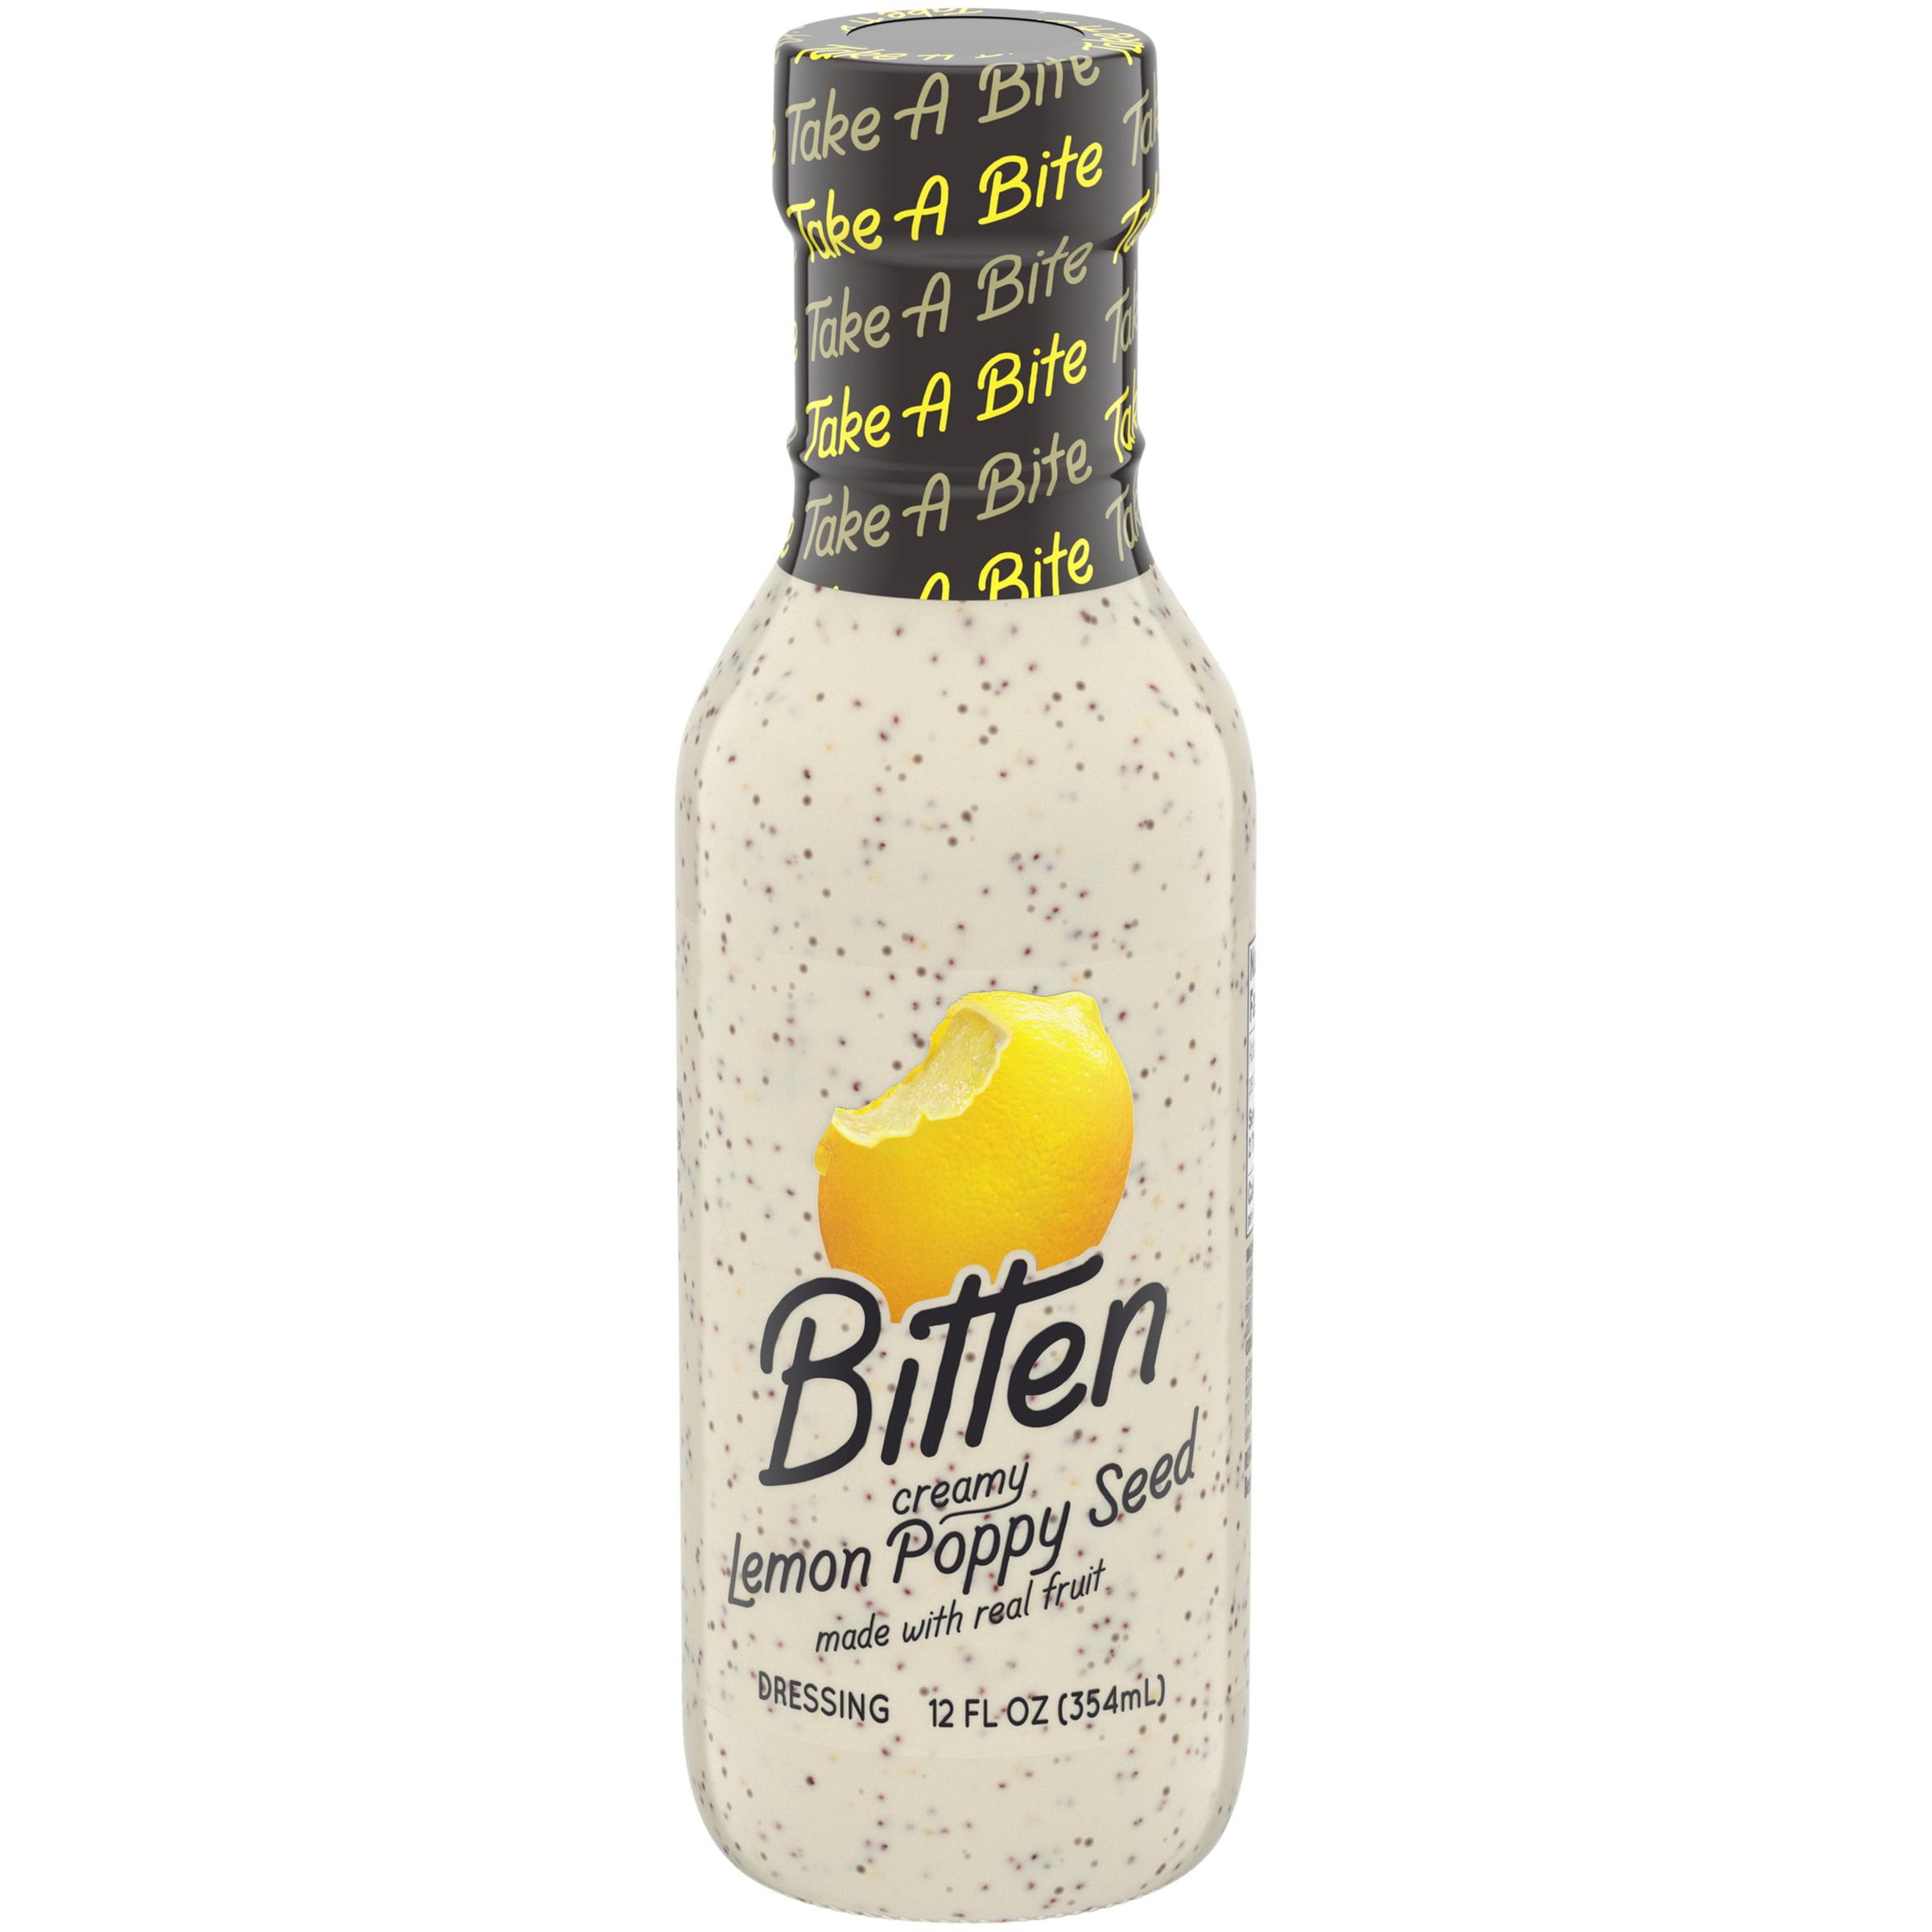 Bitten Lemon Poppy Seed Creamy Dressing with Real Fruit, 12 oz Bottle